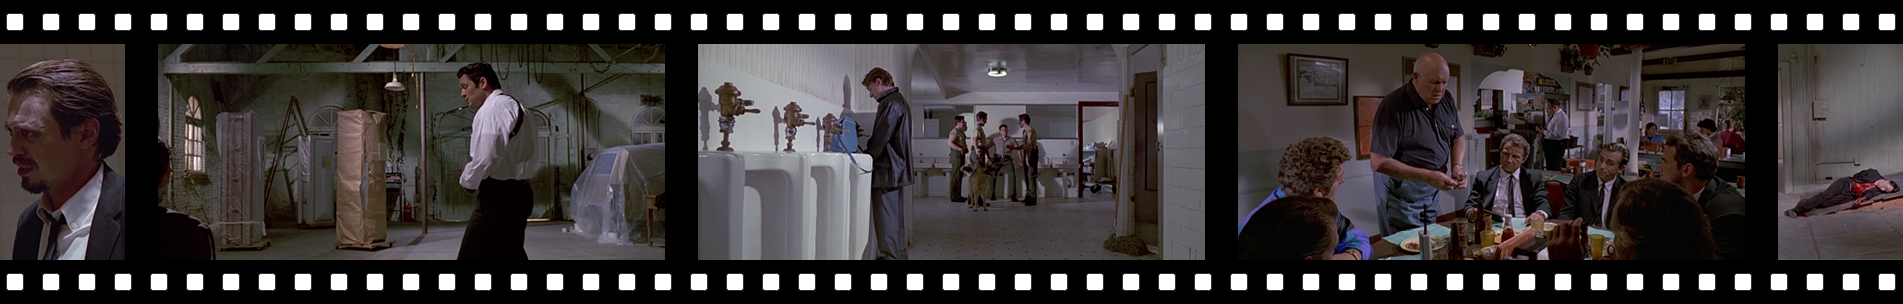 "Pellicule ""Reservoir Dogs"""